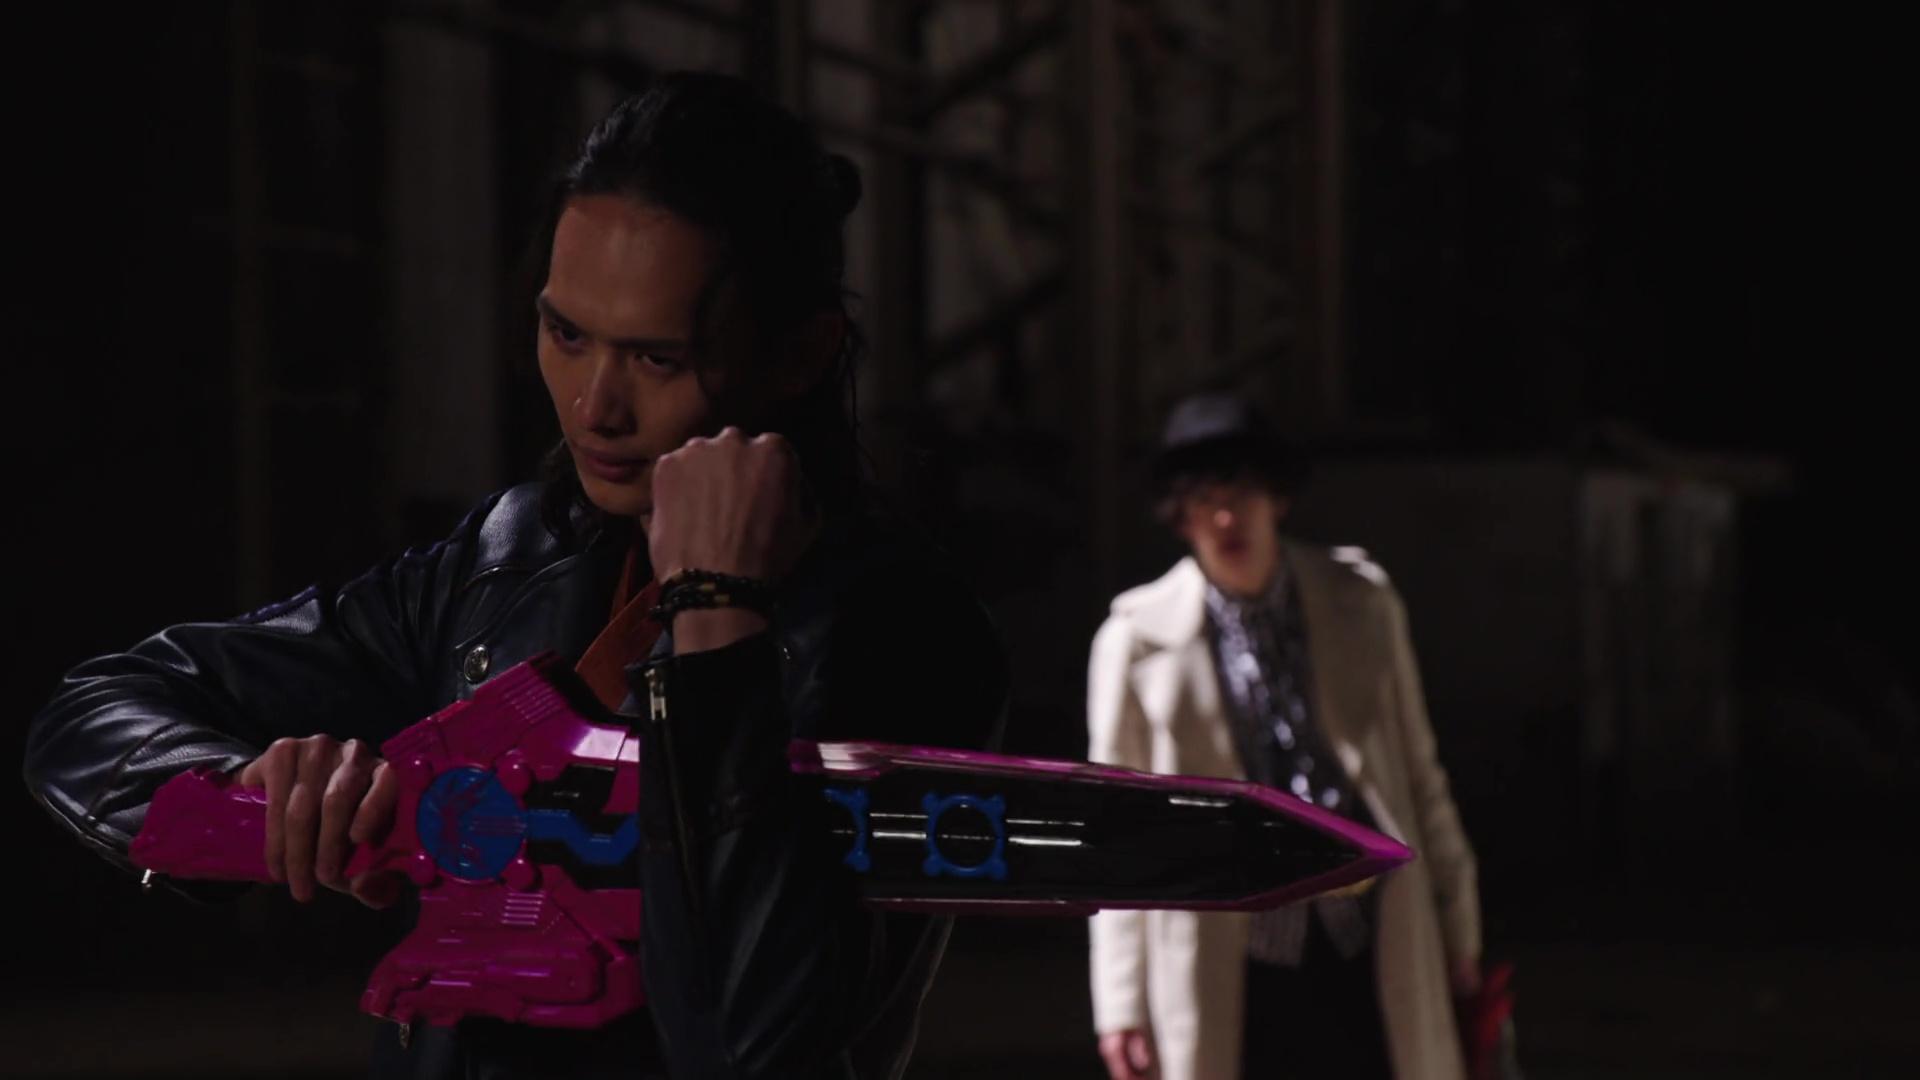 Kamen Rider Saber Episode 21 Recap